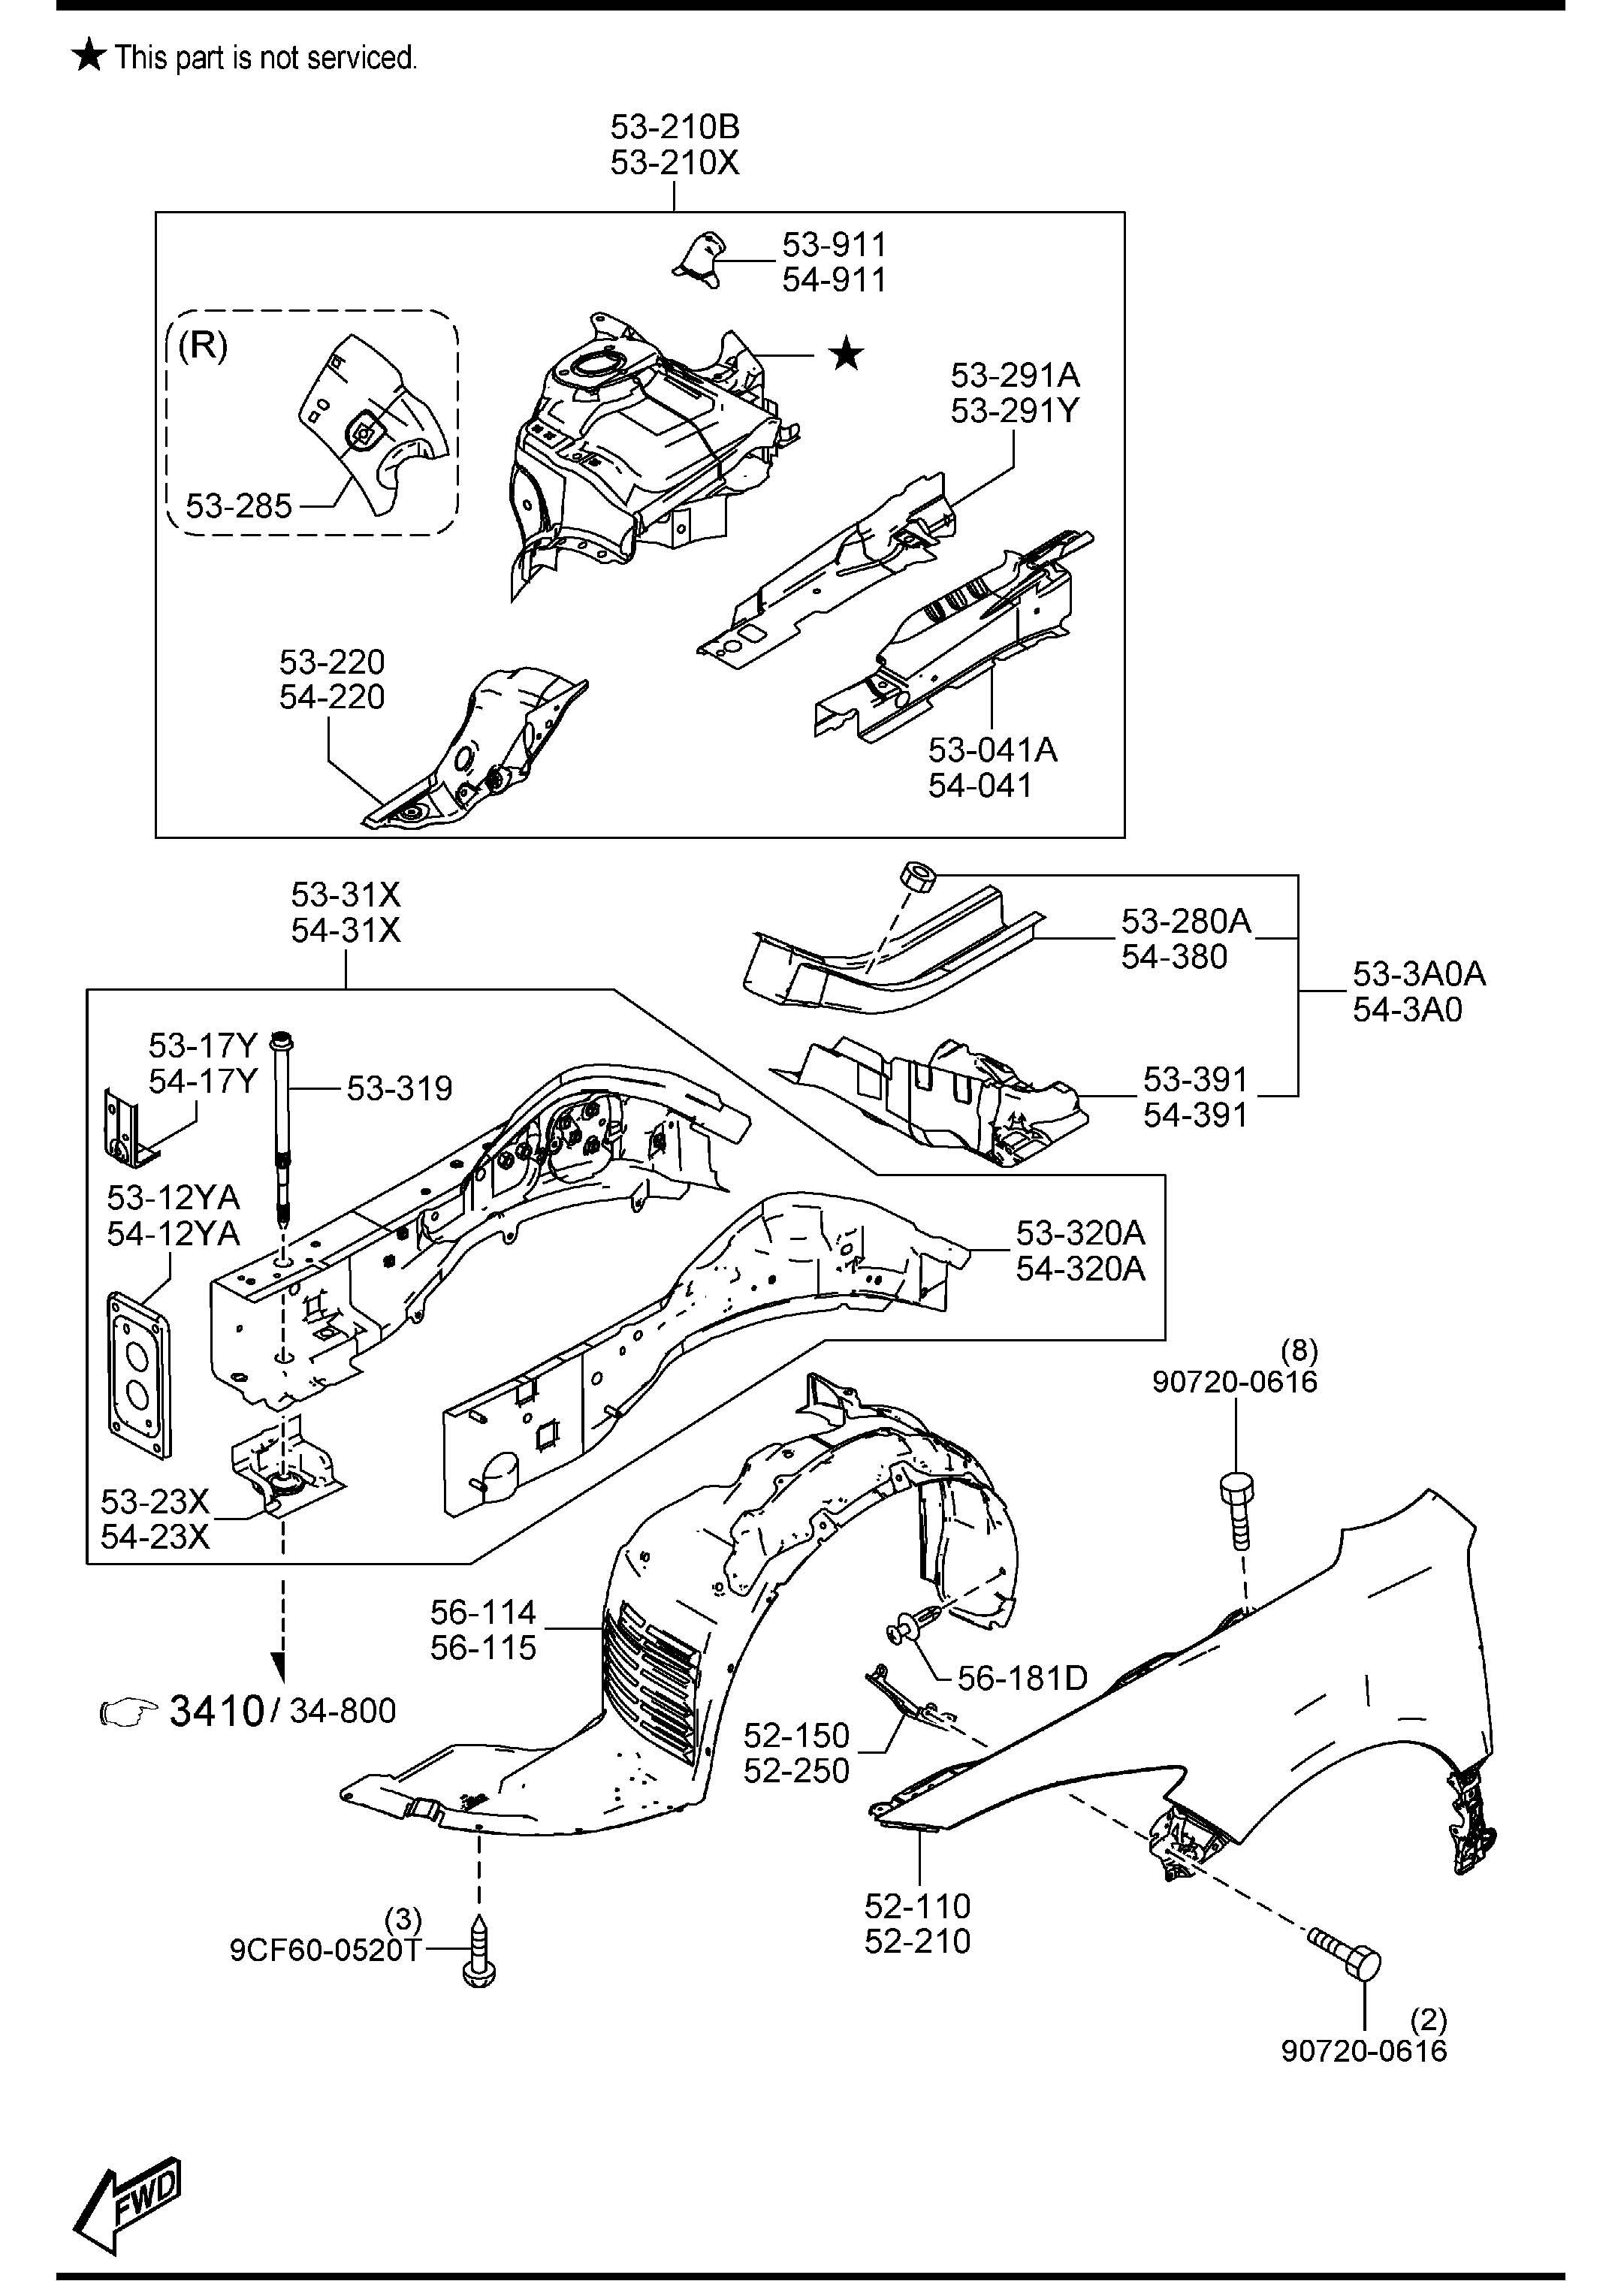 Mazda 6 Parts Mazda 6 Parts Ebay Mazda 6 Engine